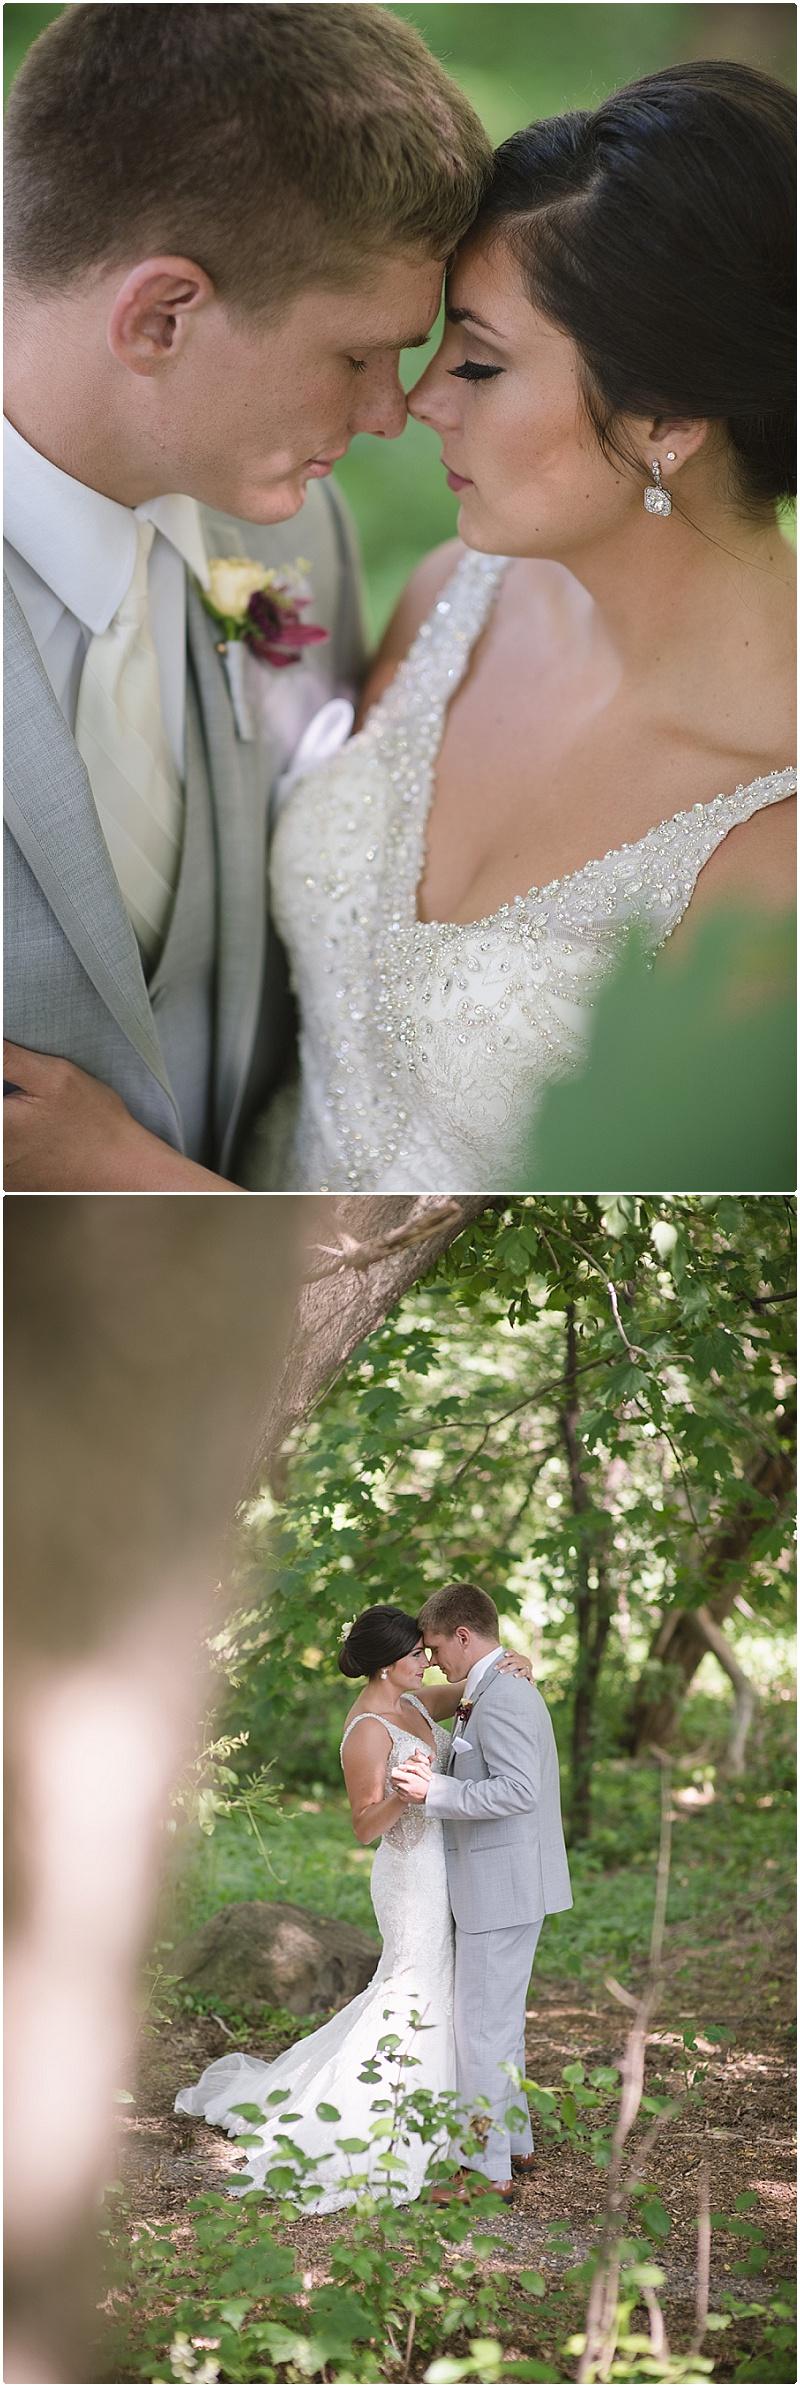 Gianna's Photography Wedding Dellwood Country Club Minnesota (11).jpg